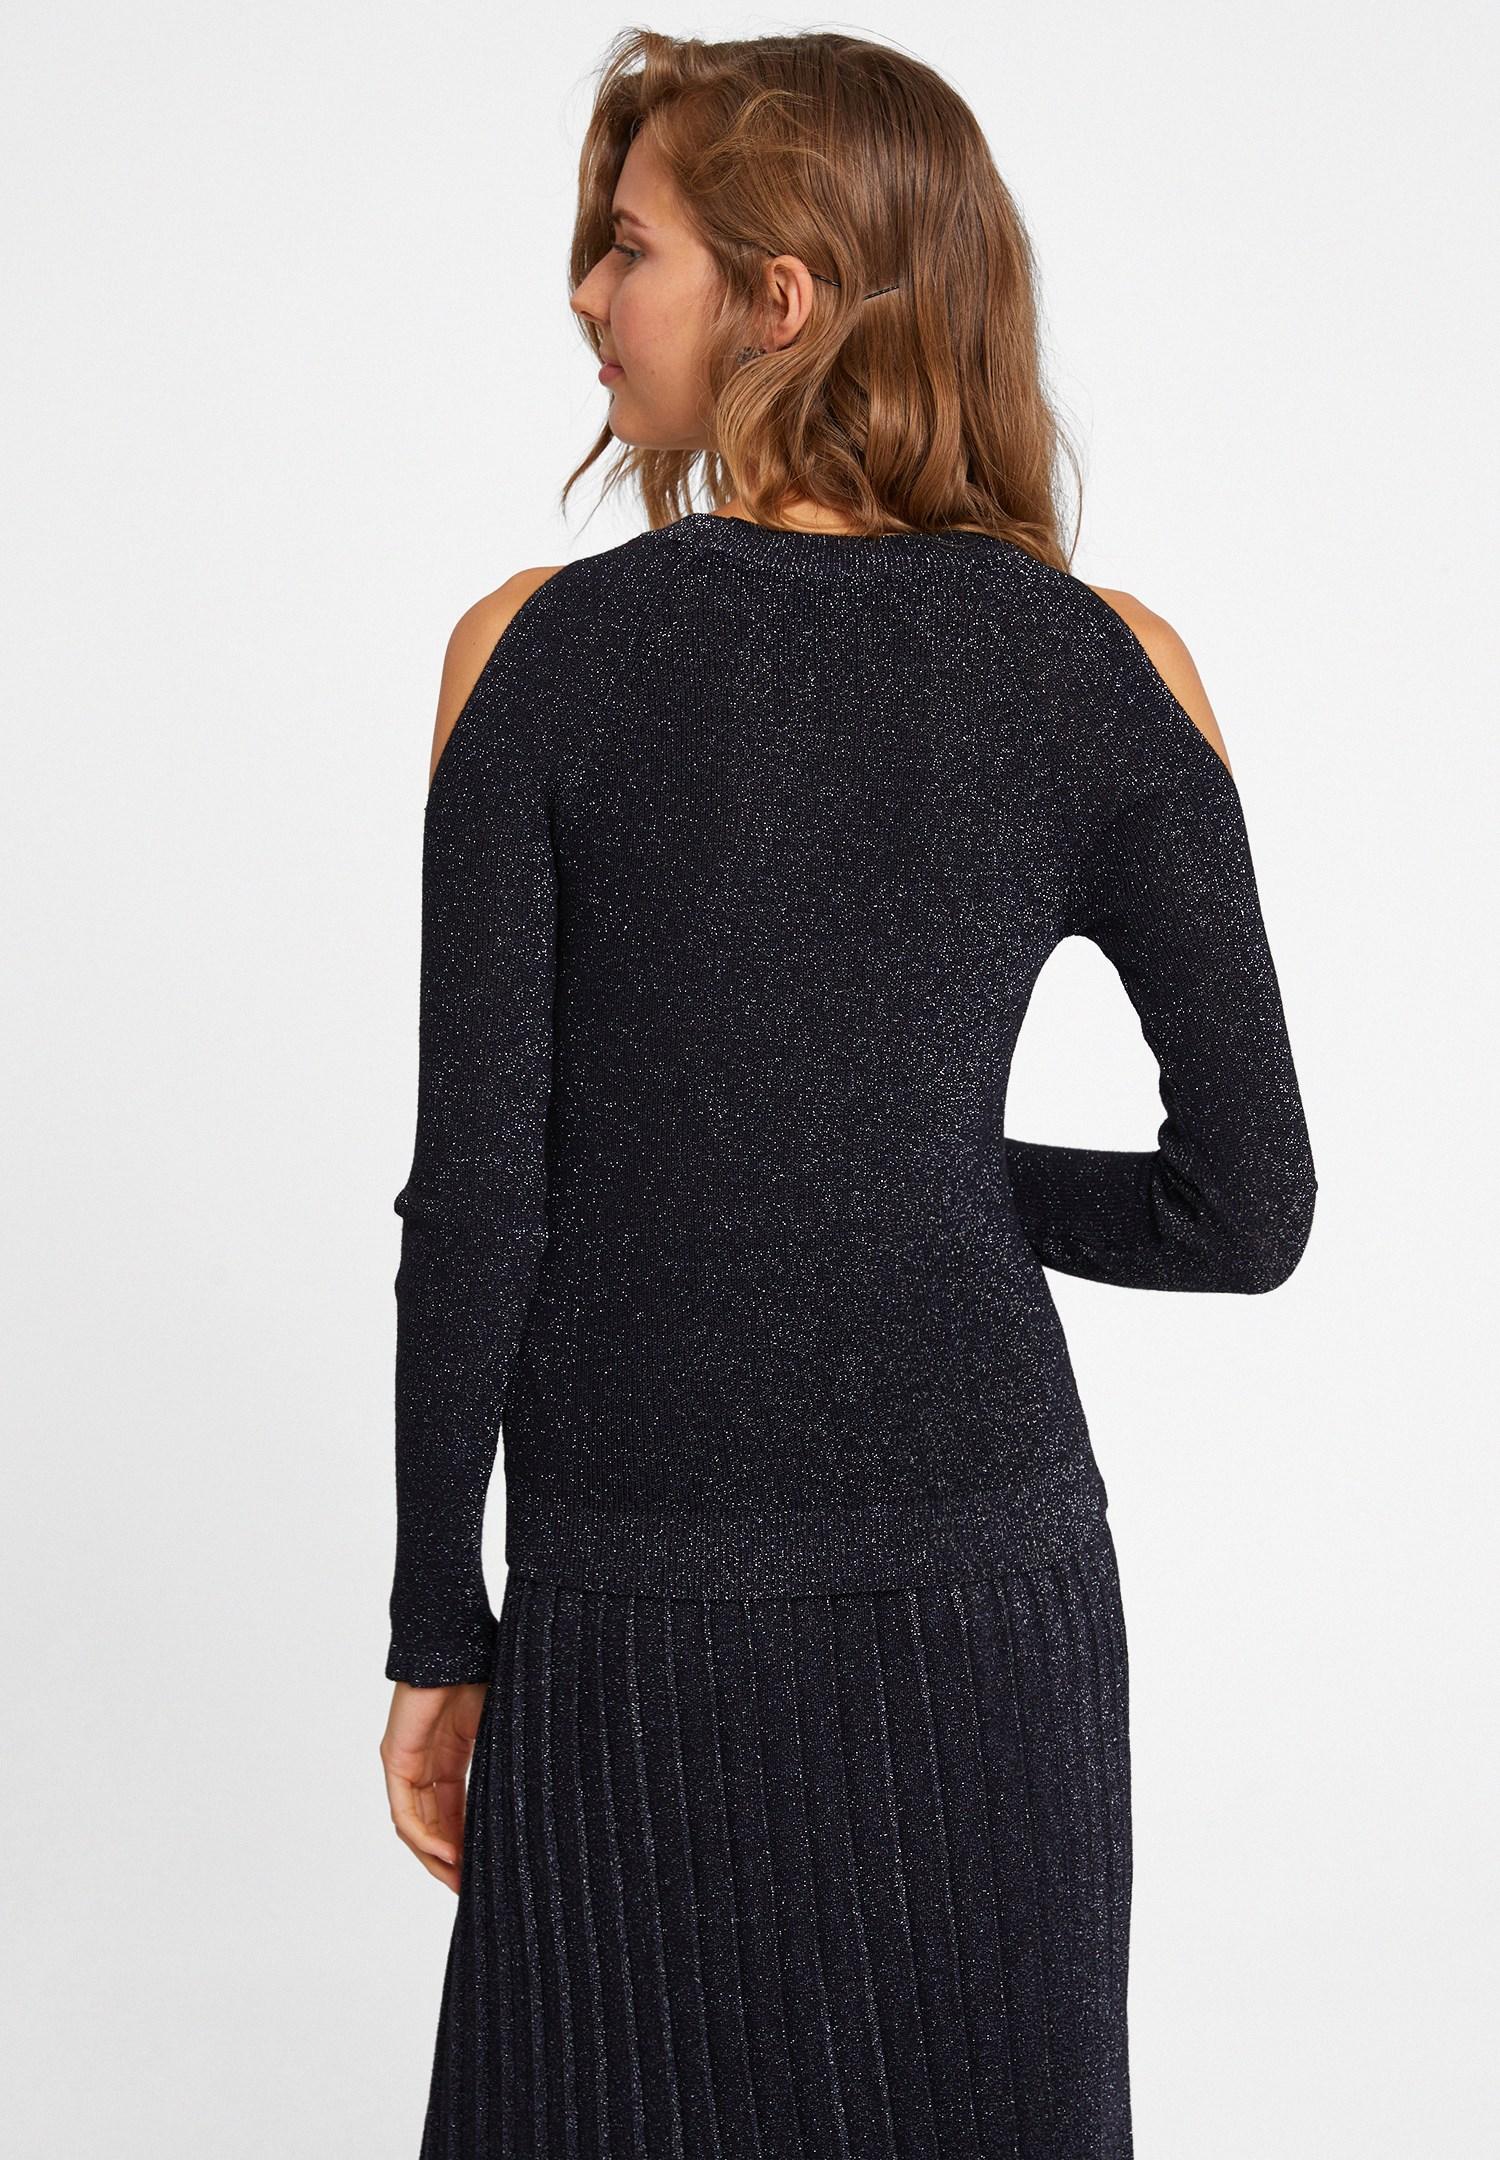 Women Black Knitwear with Cut Out Detail